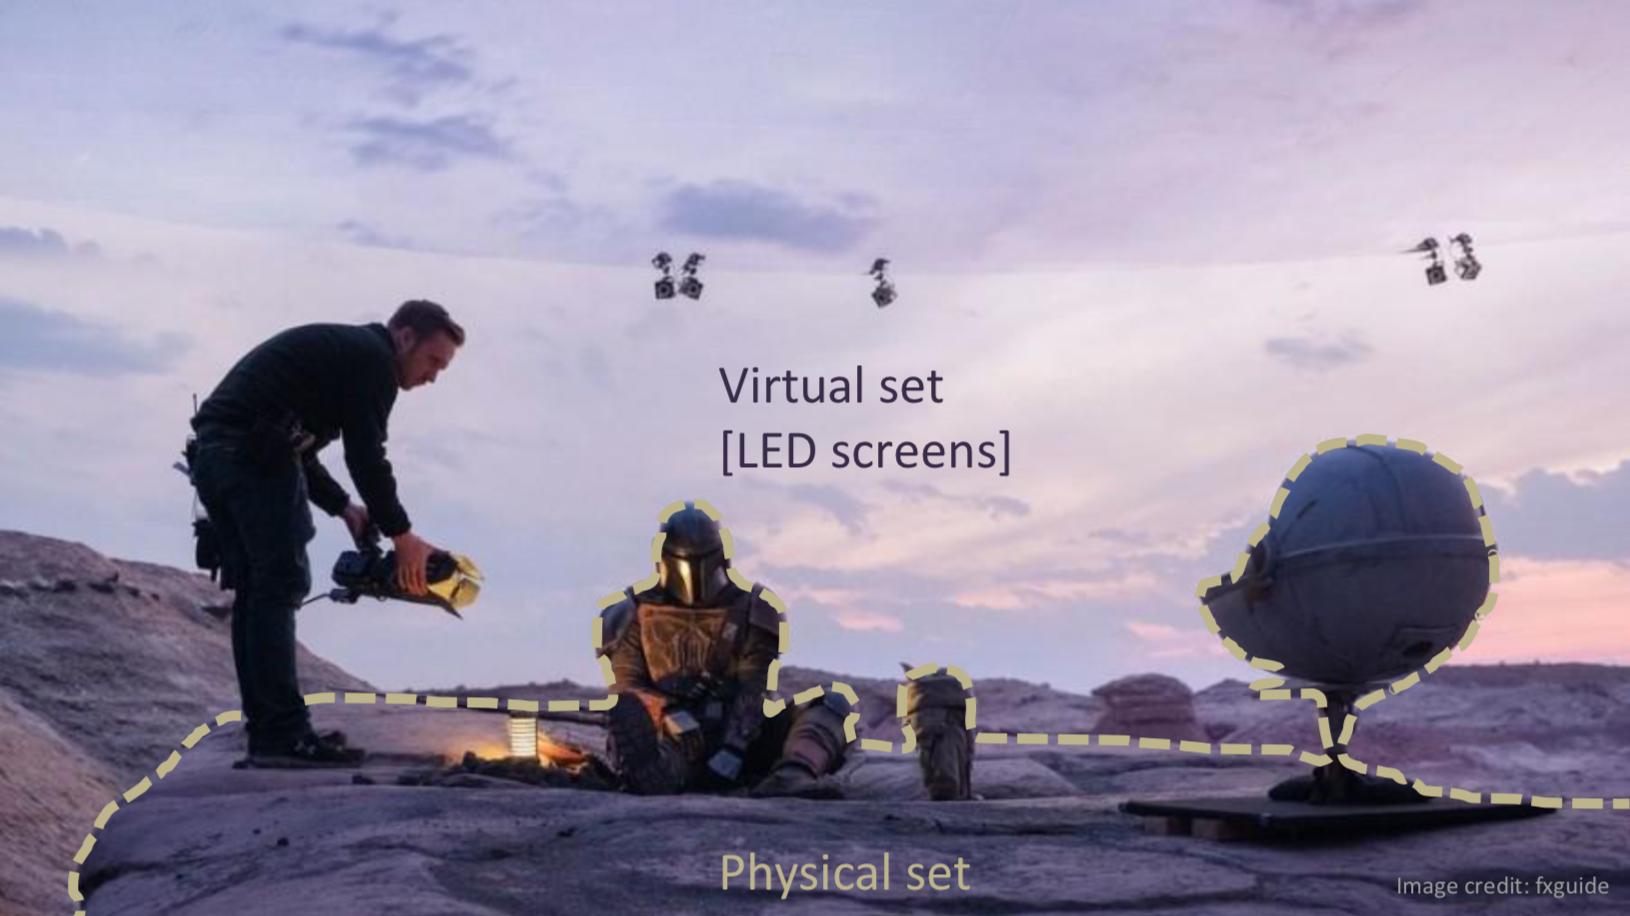 Virtual production LED screen wall